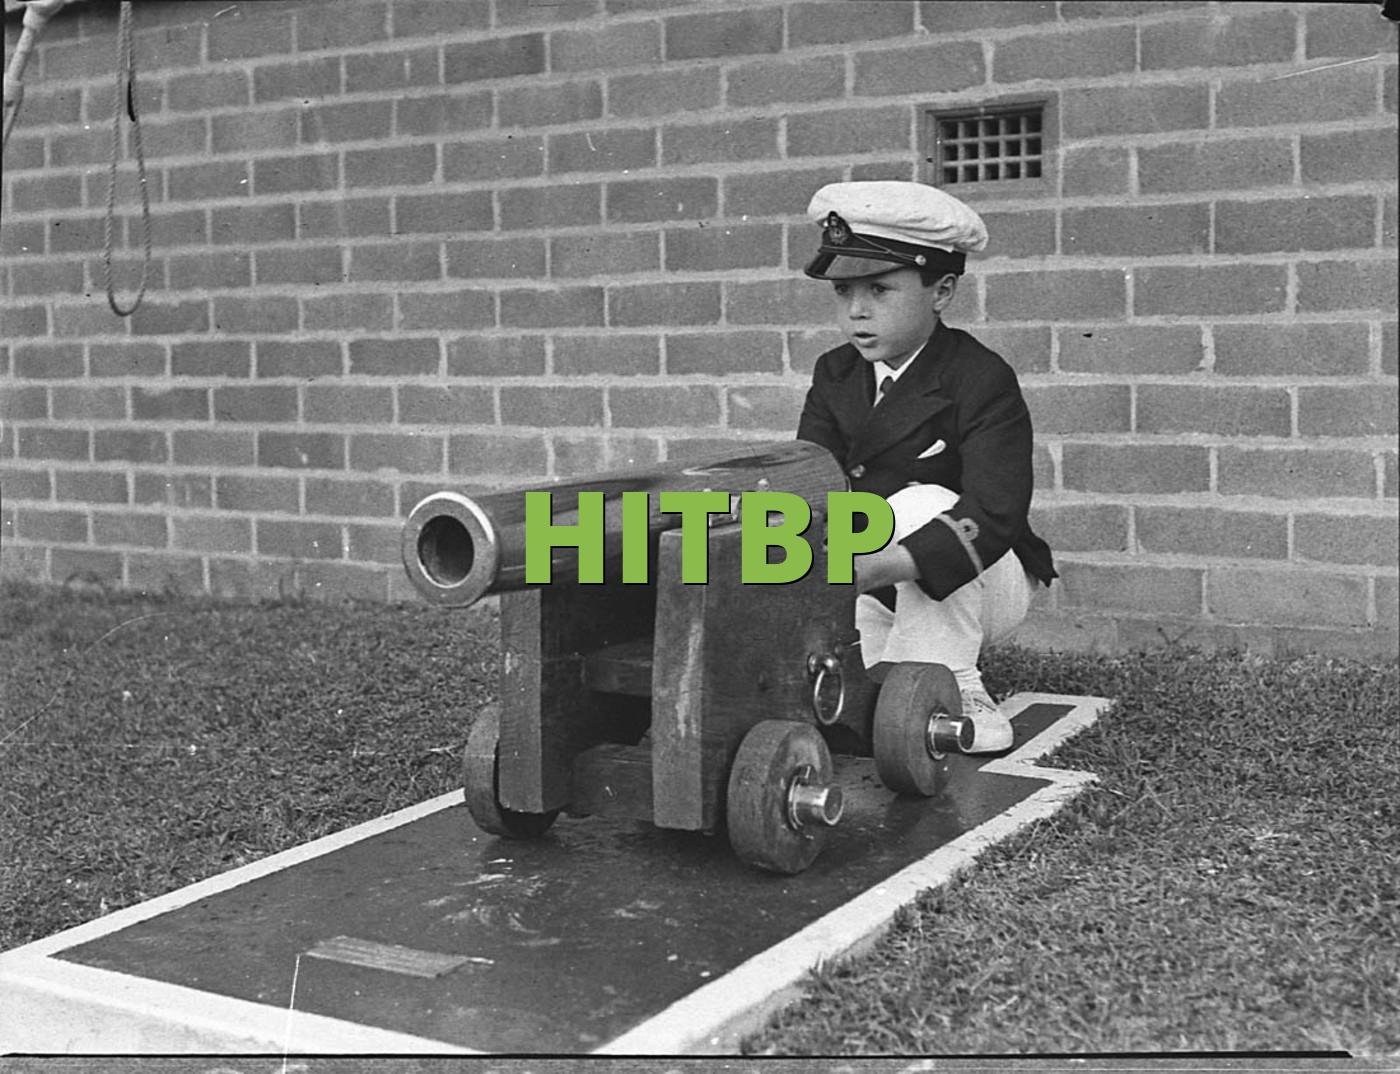 HITBP